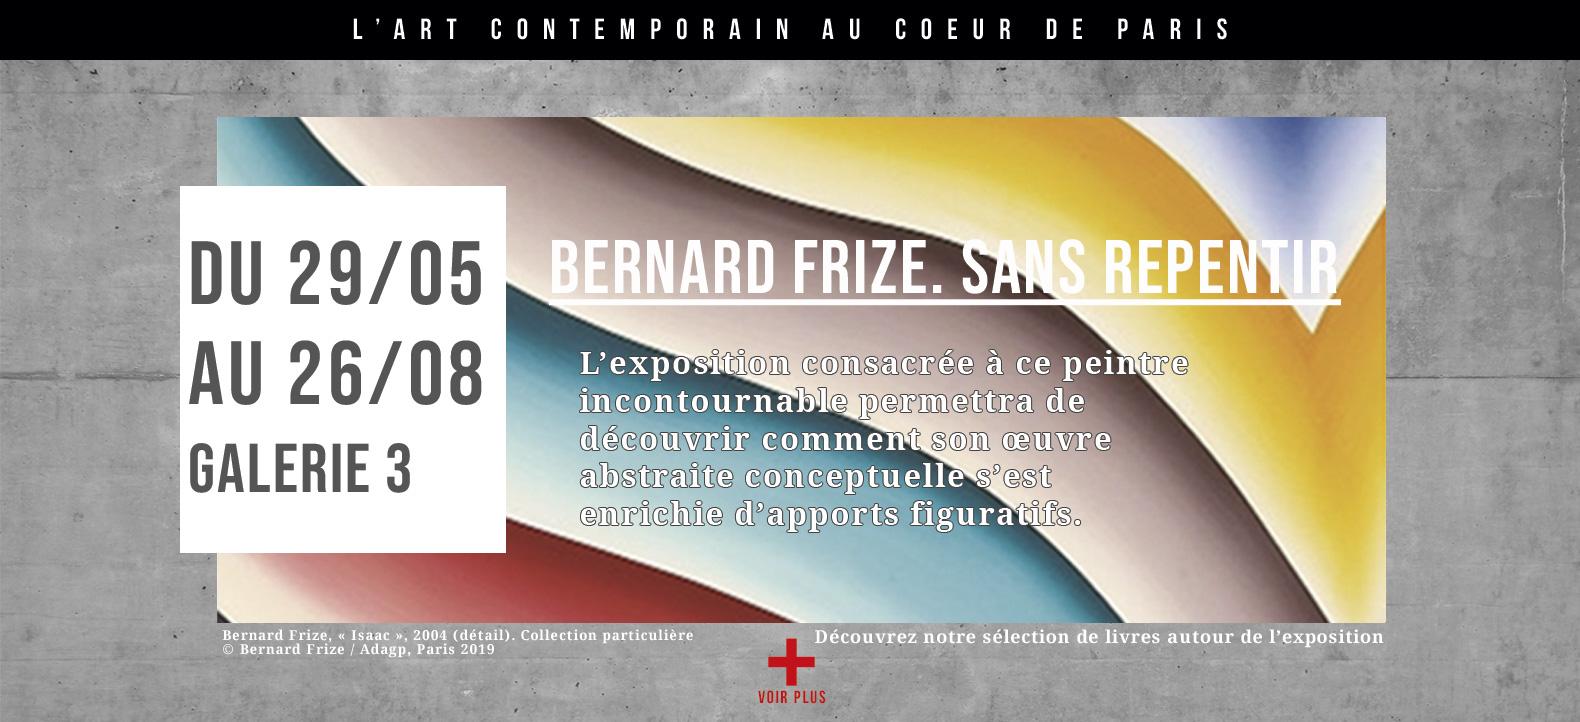 Bernard Frize